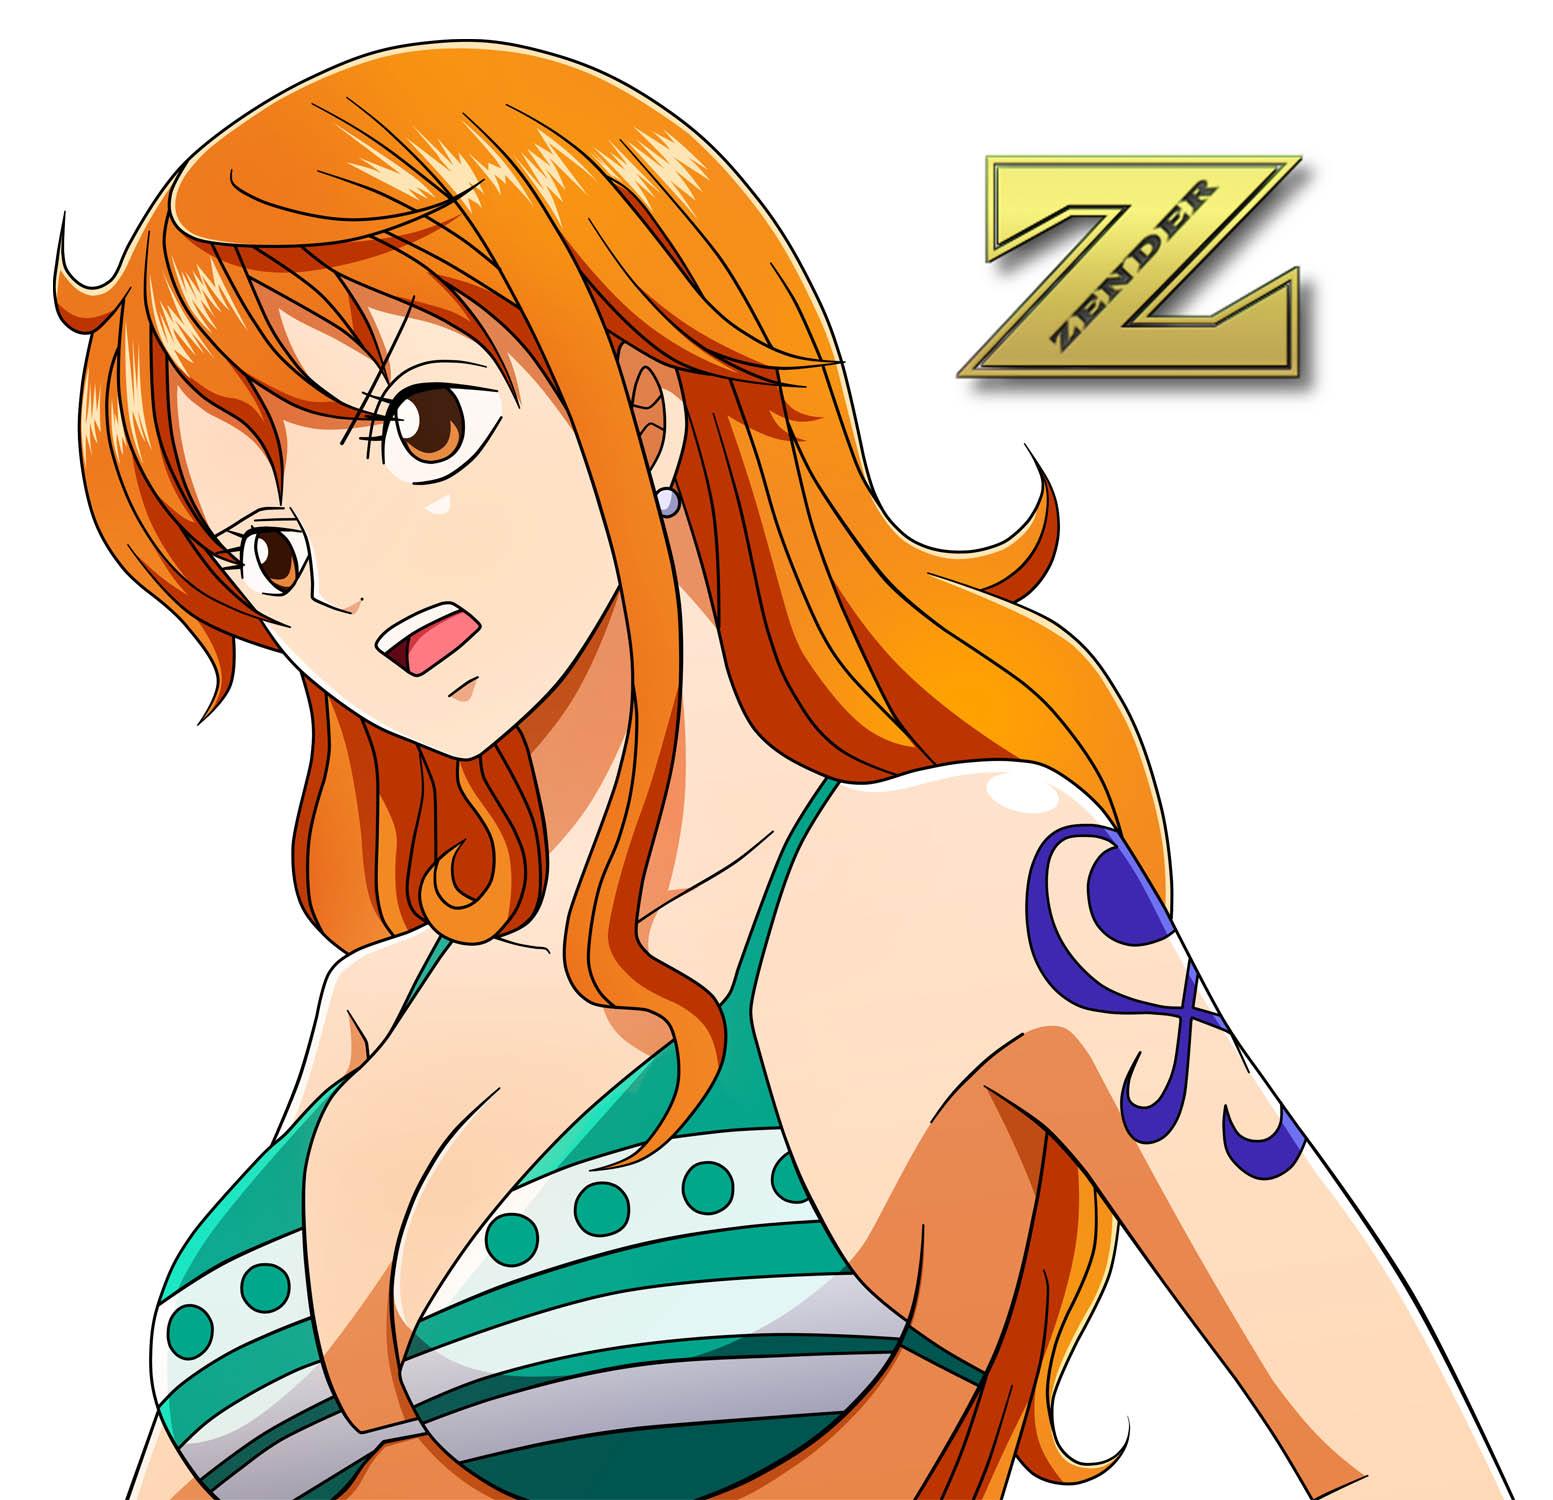 nami of one piece sexy bikini pics 04